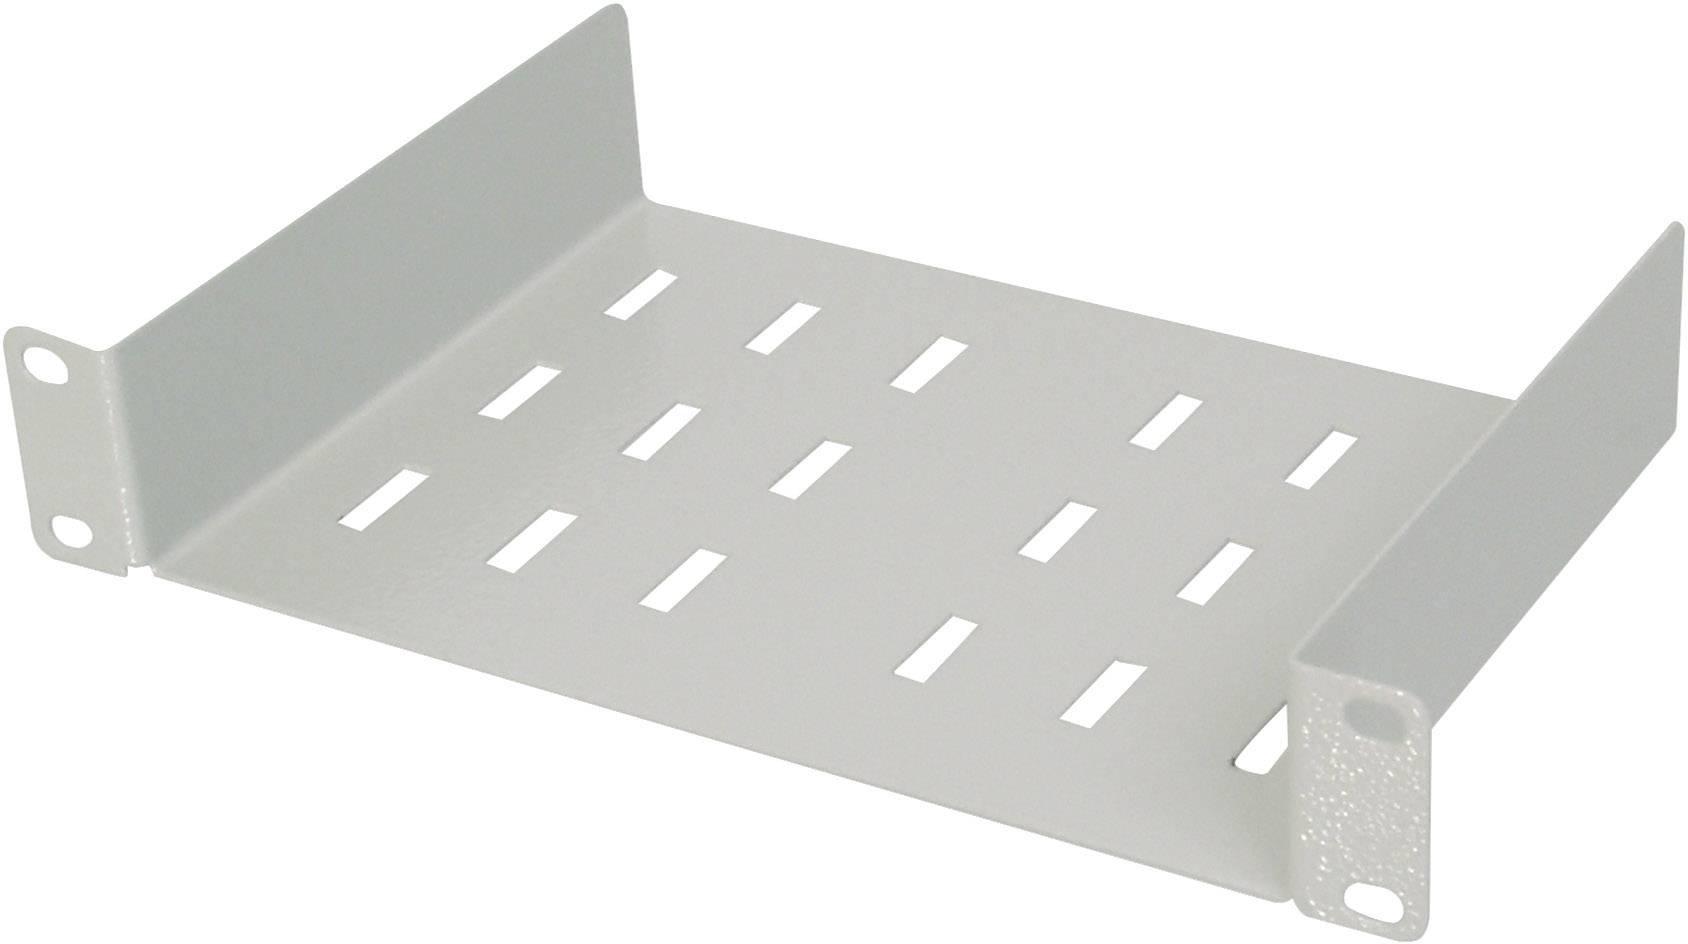 10 Server Rack Cabinet Shelf Digitus Dn 10 Tray 1 Fixed